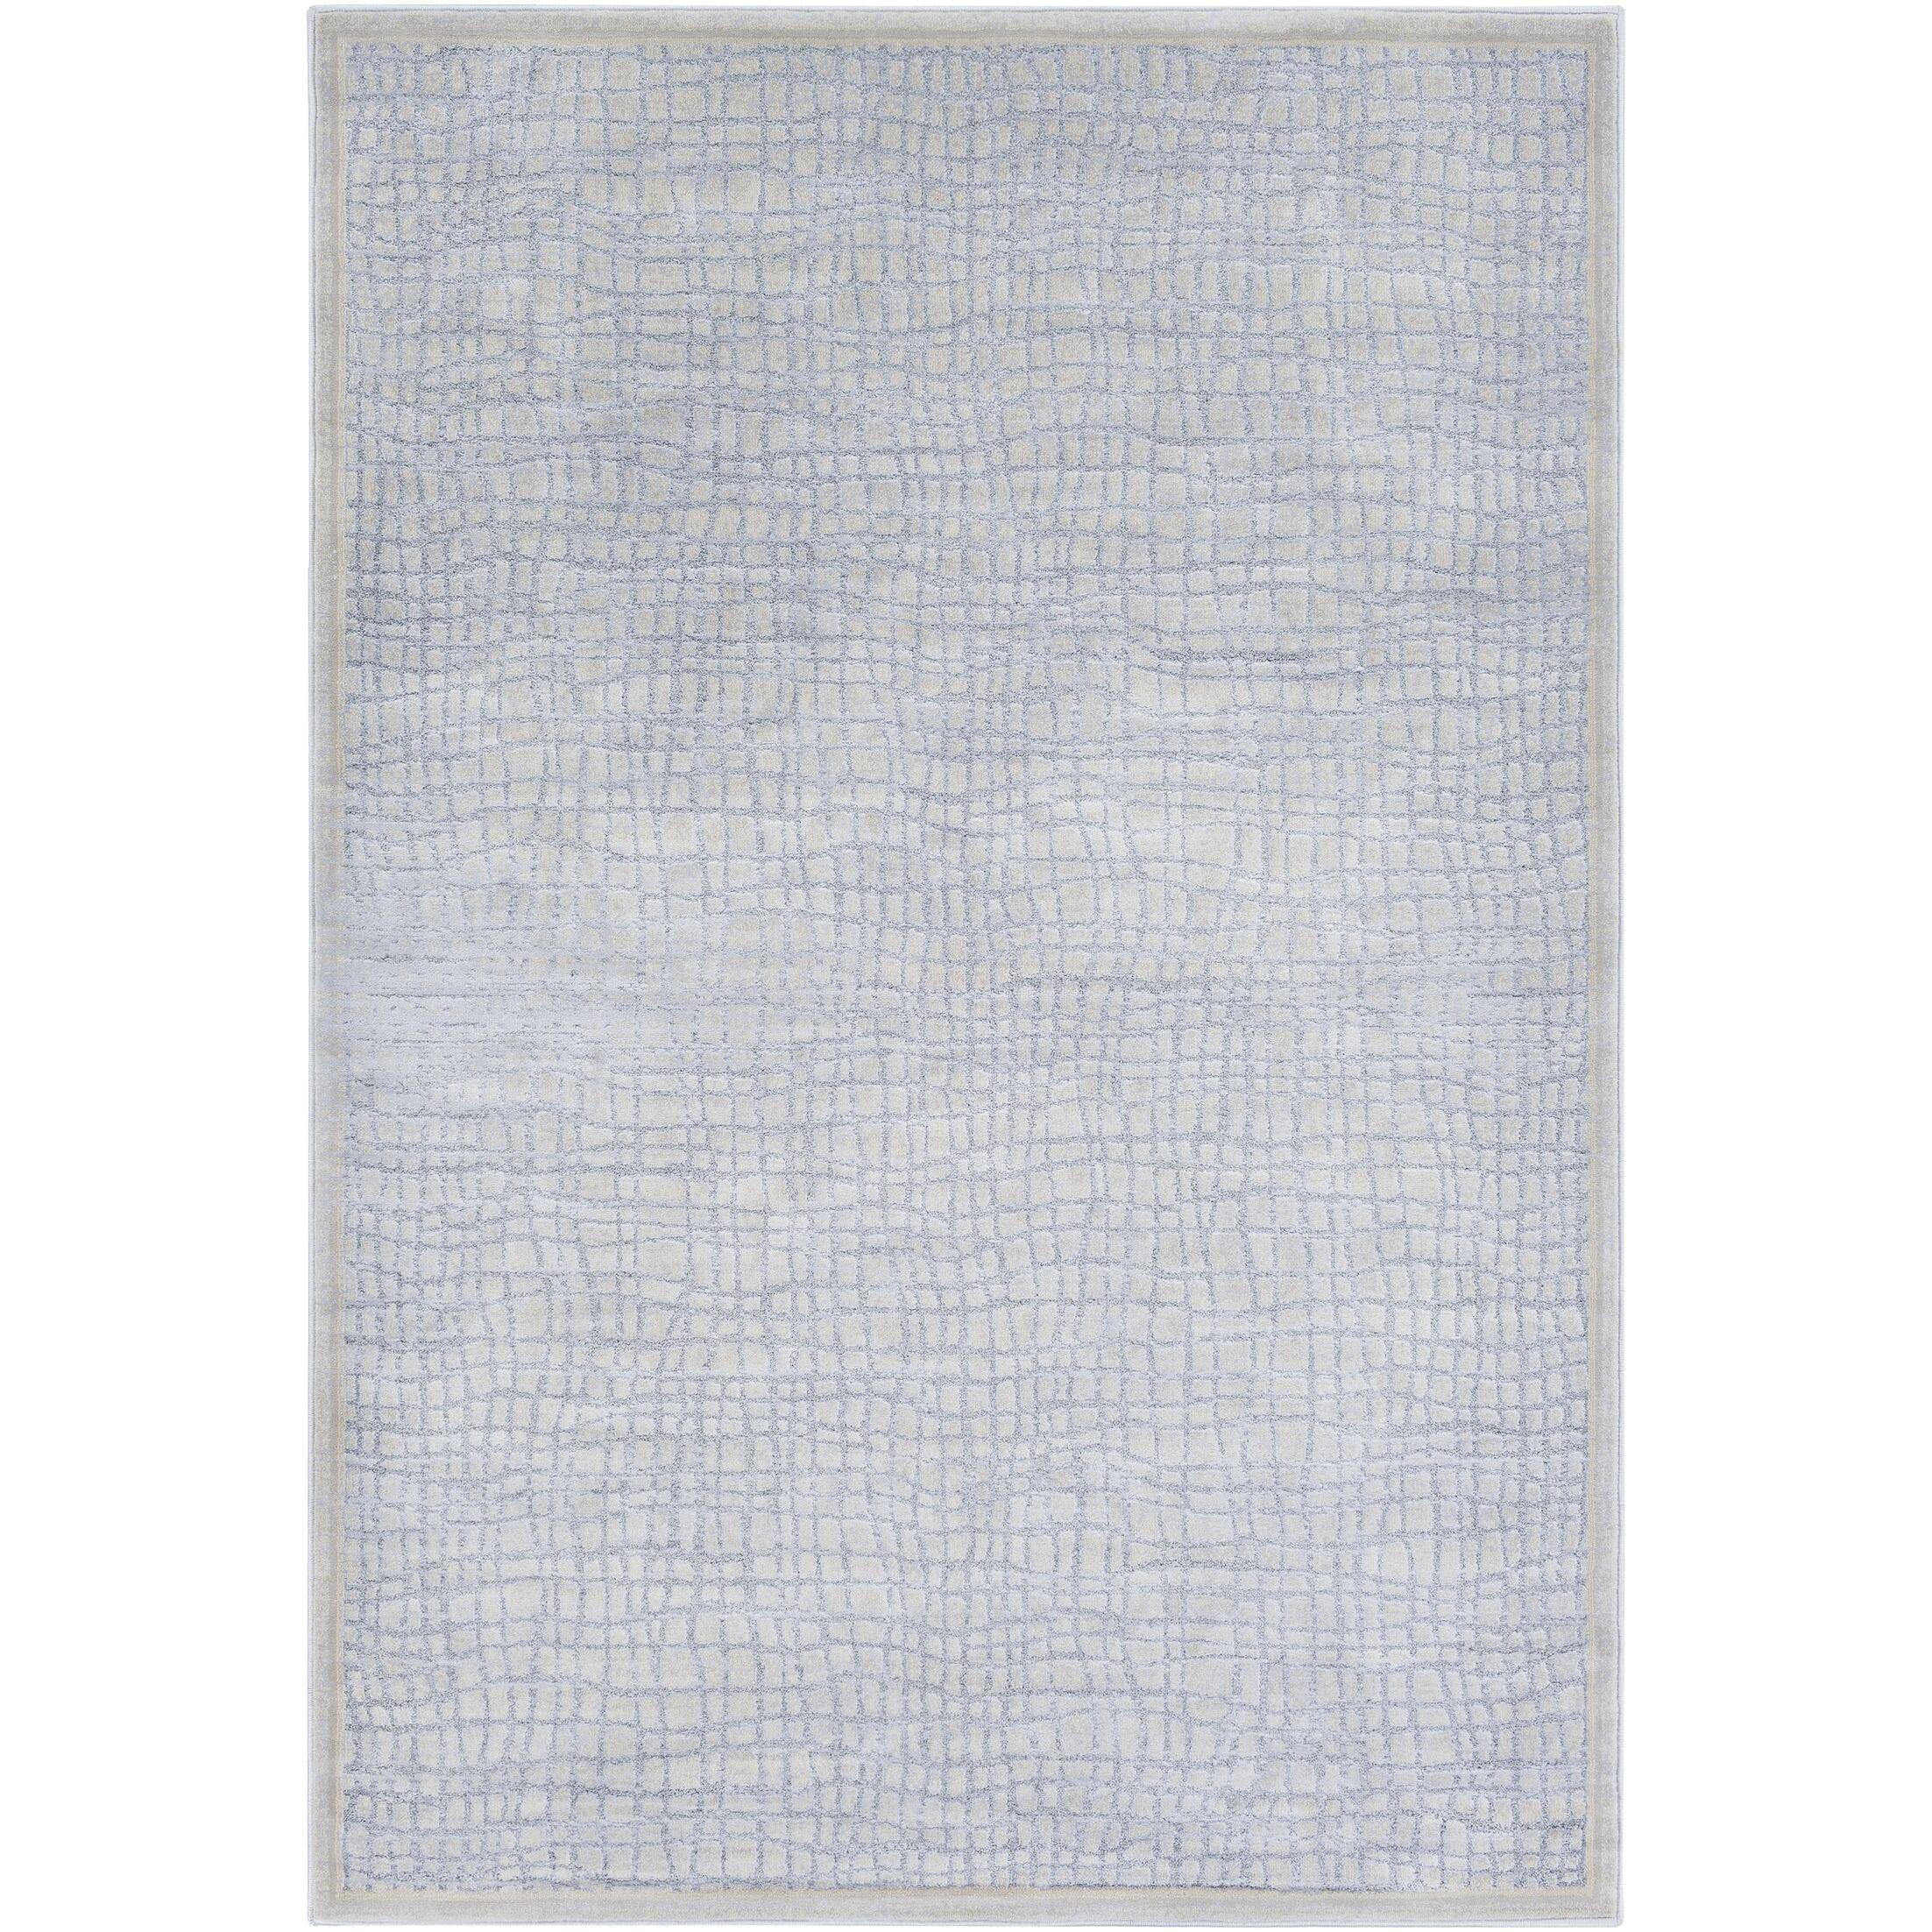 Kala Medium Gray/Taupe Area Rug Rug Size: 8' x 10'